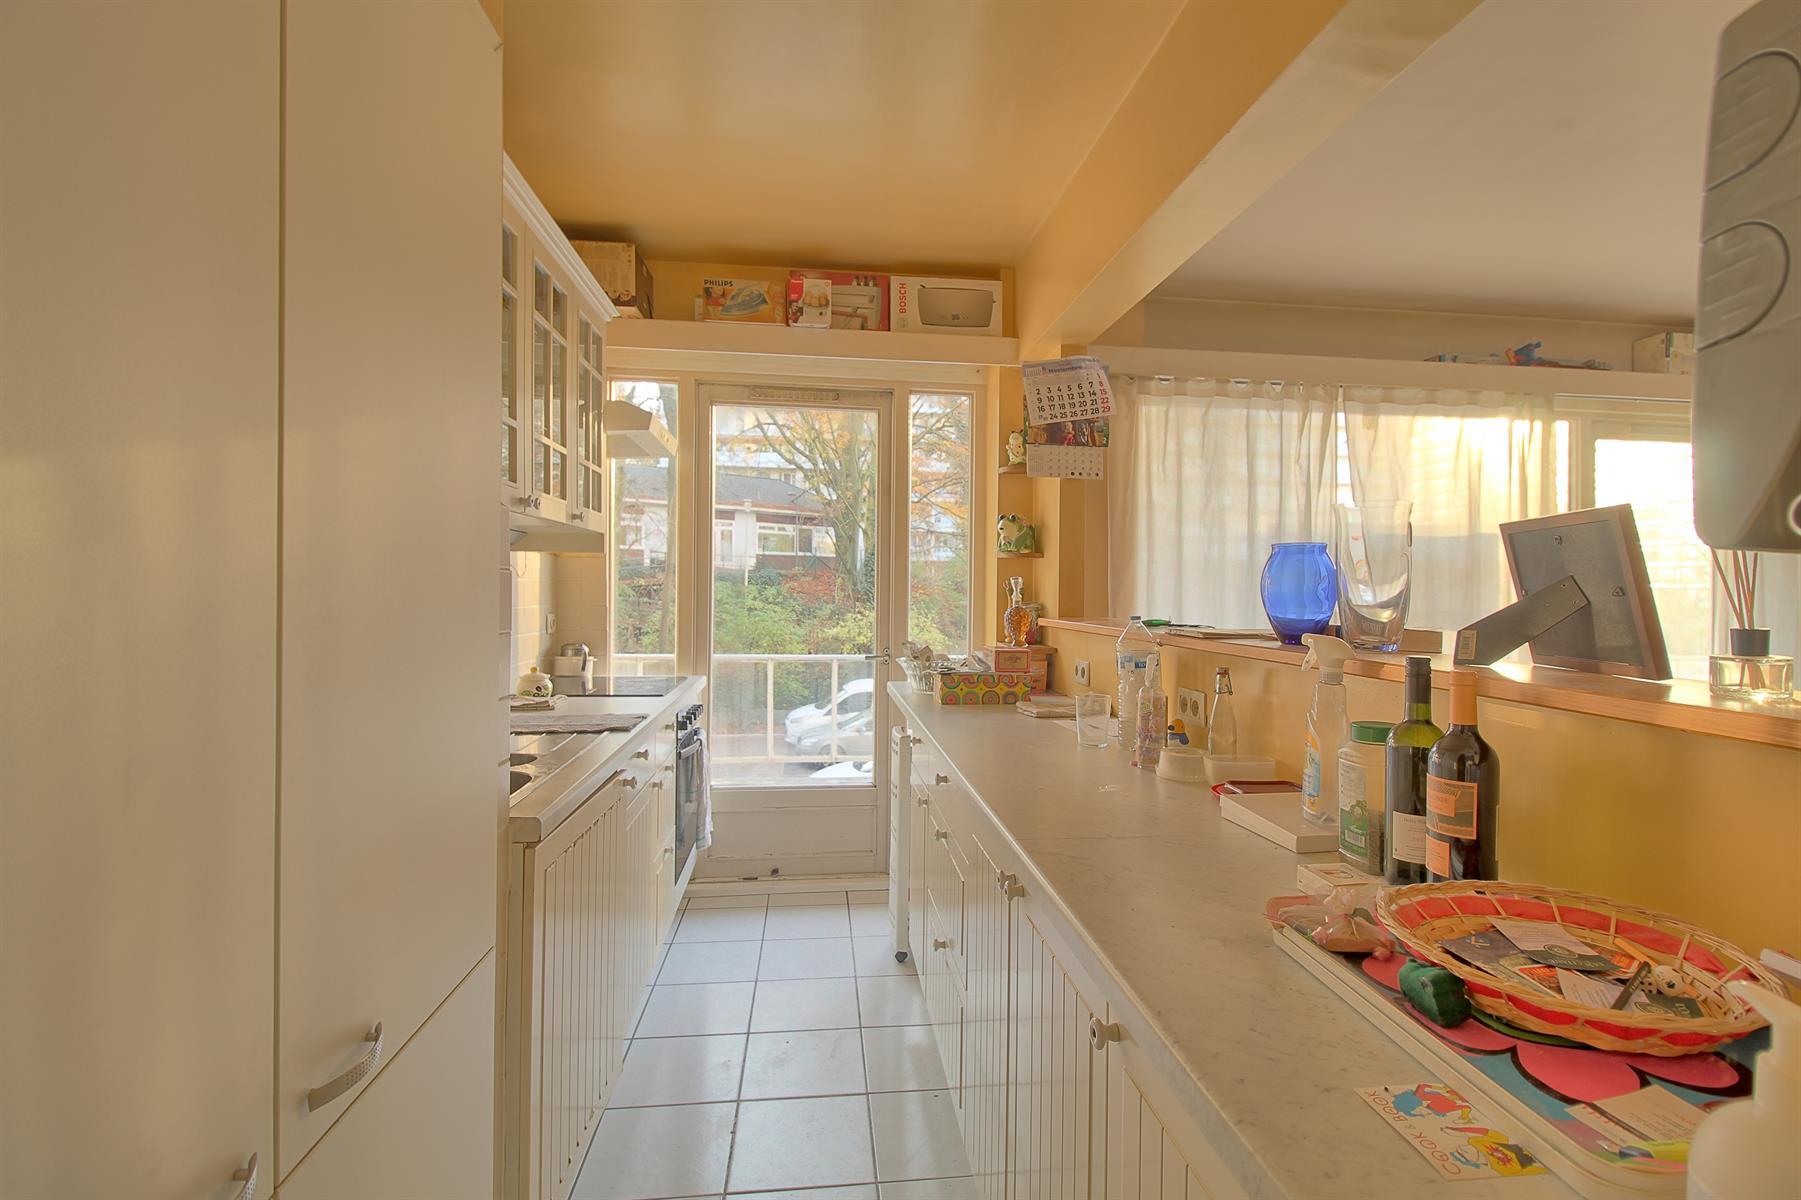 Appartement - Woluwe-Saint-Lambert - #4213719-1